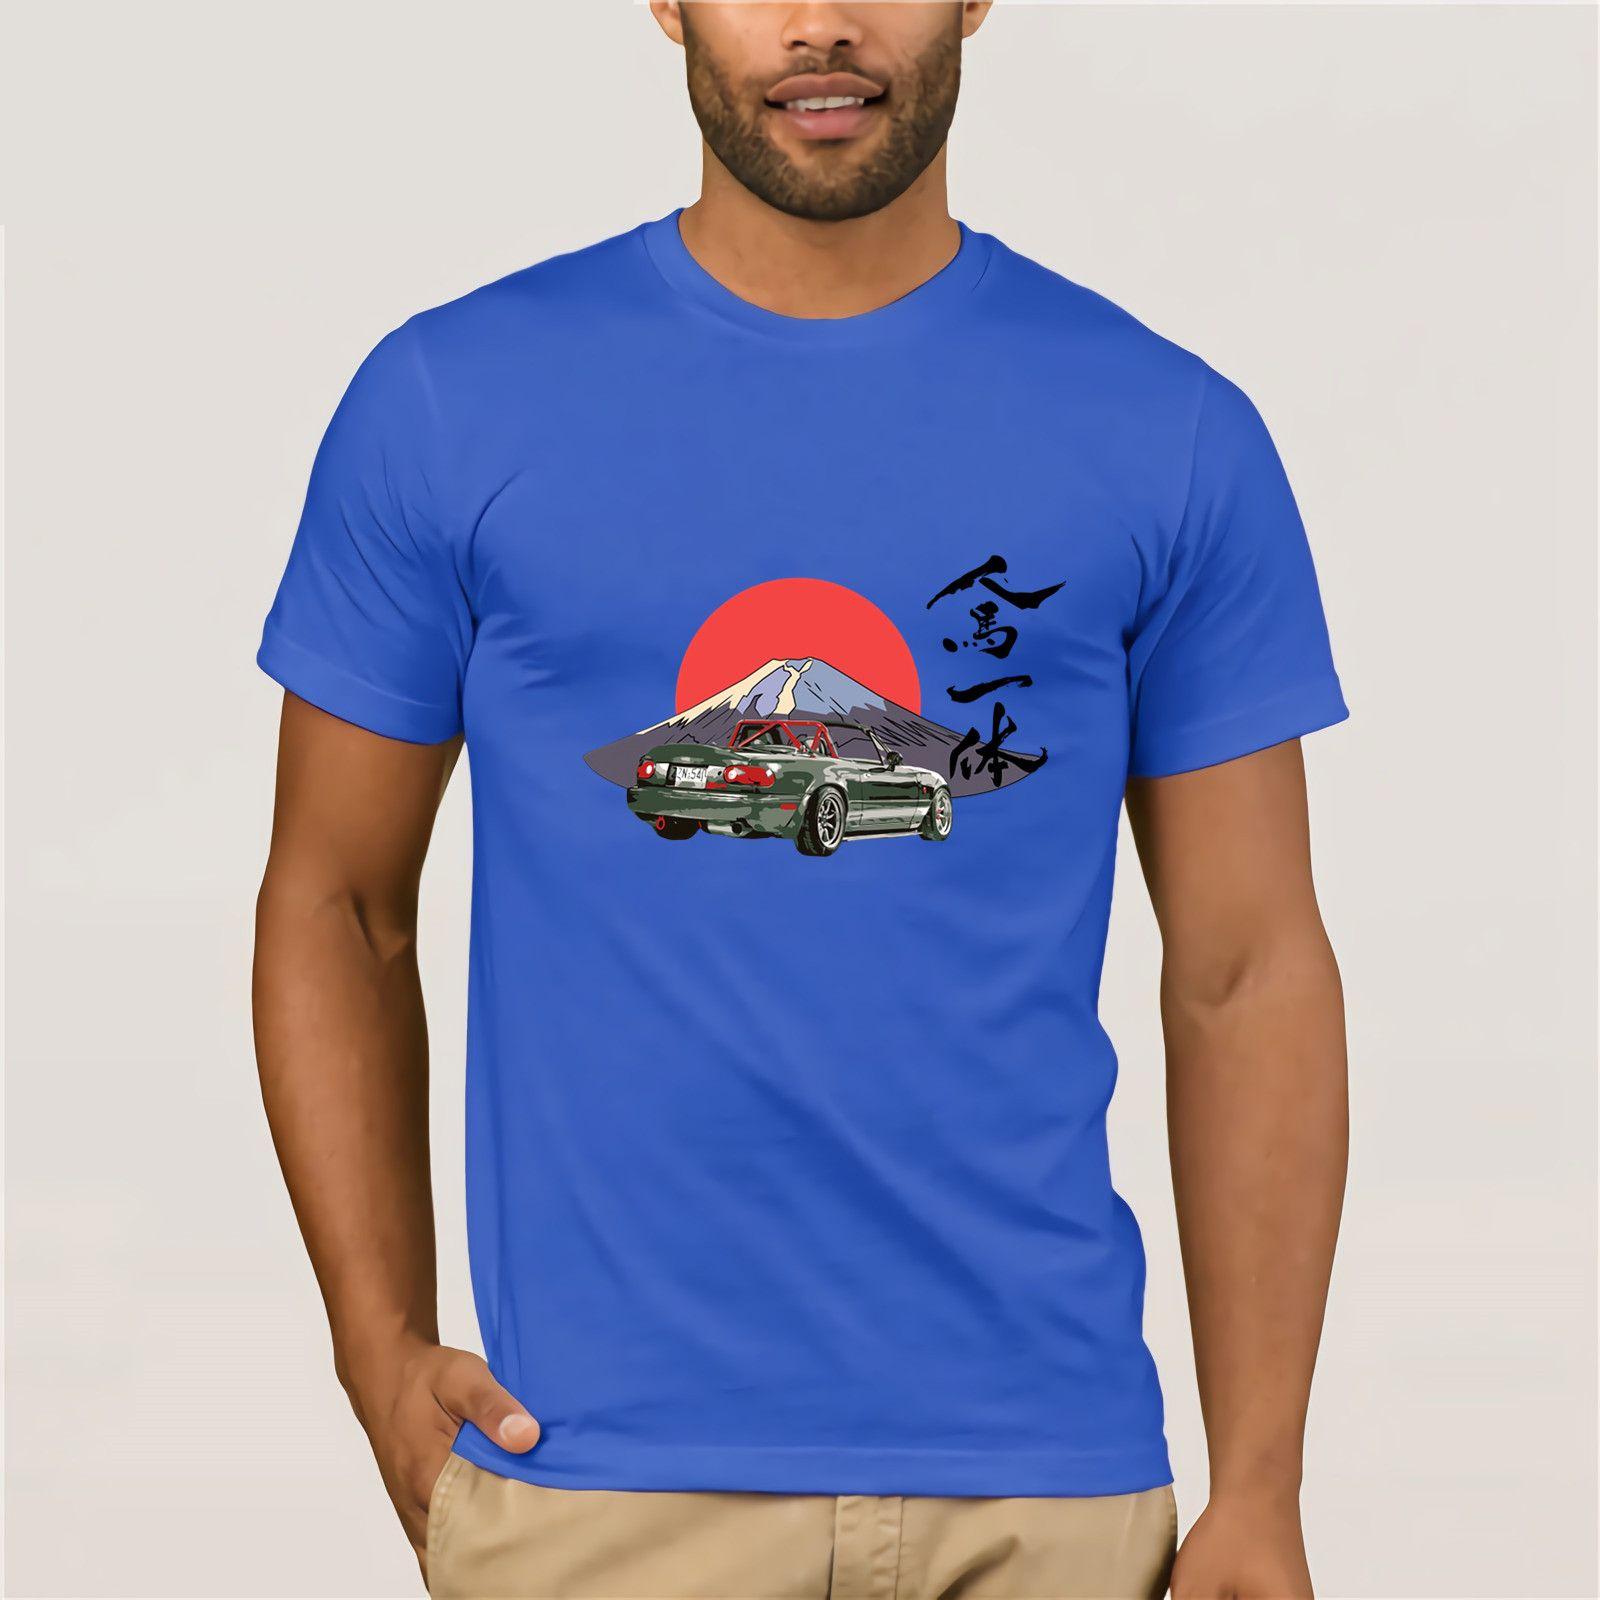 0ae64fc7dca 2019 Japanese Style Mazda Miata Mx5 T Shirt Hombre Jinba Ittai Mount Fuji  Edition T Shirt Homme Graphic Printed Tshirt Camisetas Buy T Shirts Online T  Shirt ...